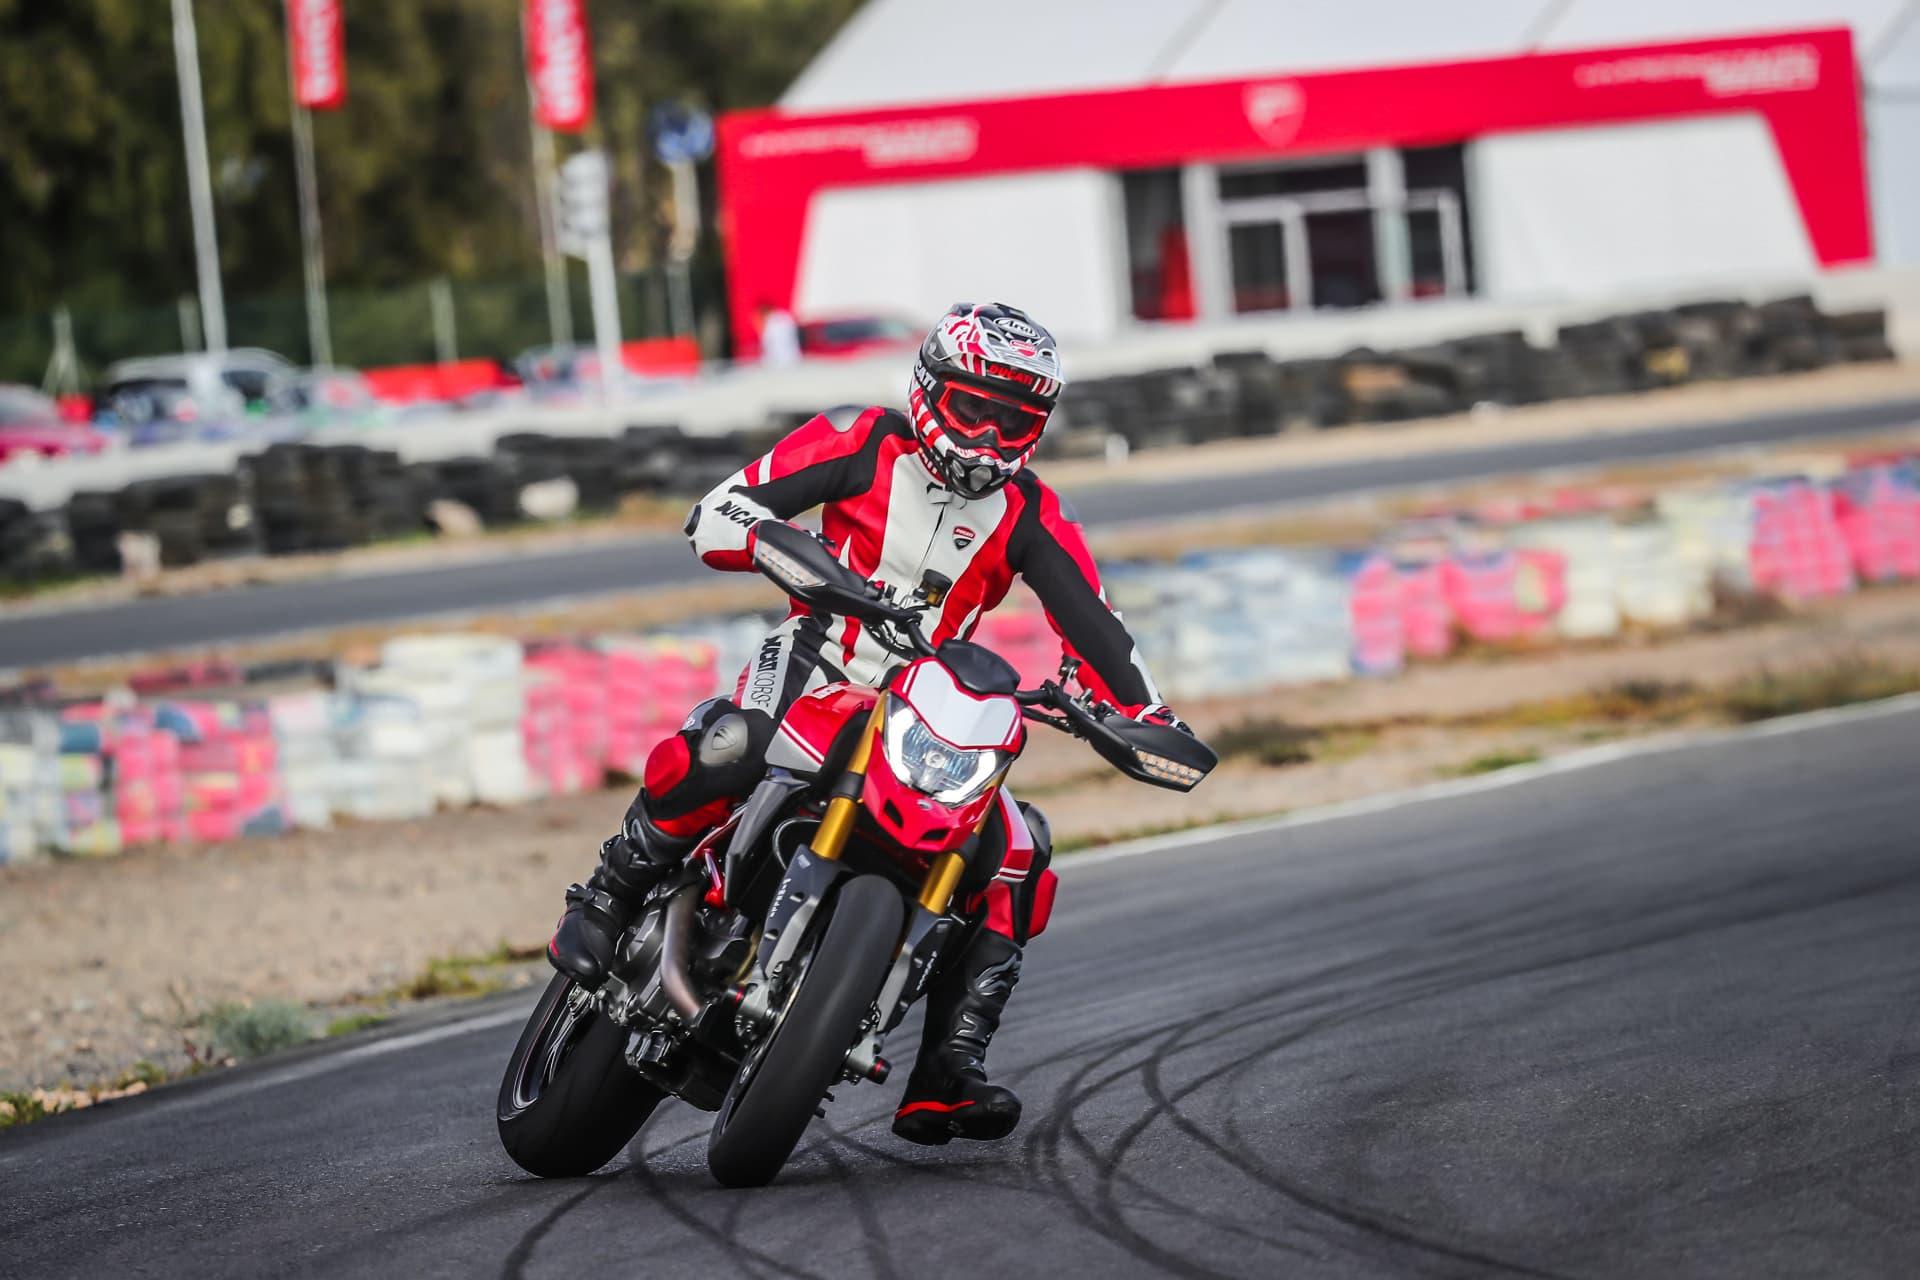 Ducati Hypermotard 950 Sp Performance 11 Uc70340 Mid